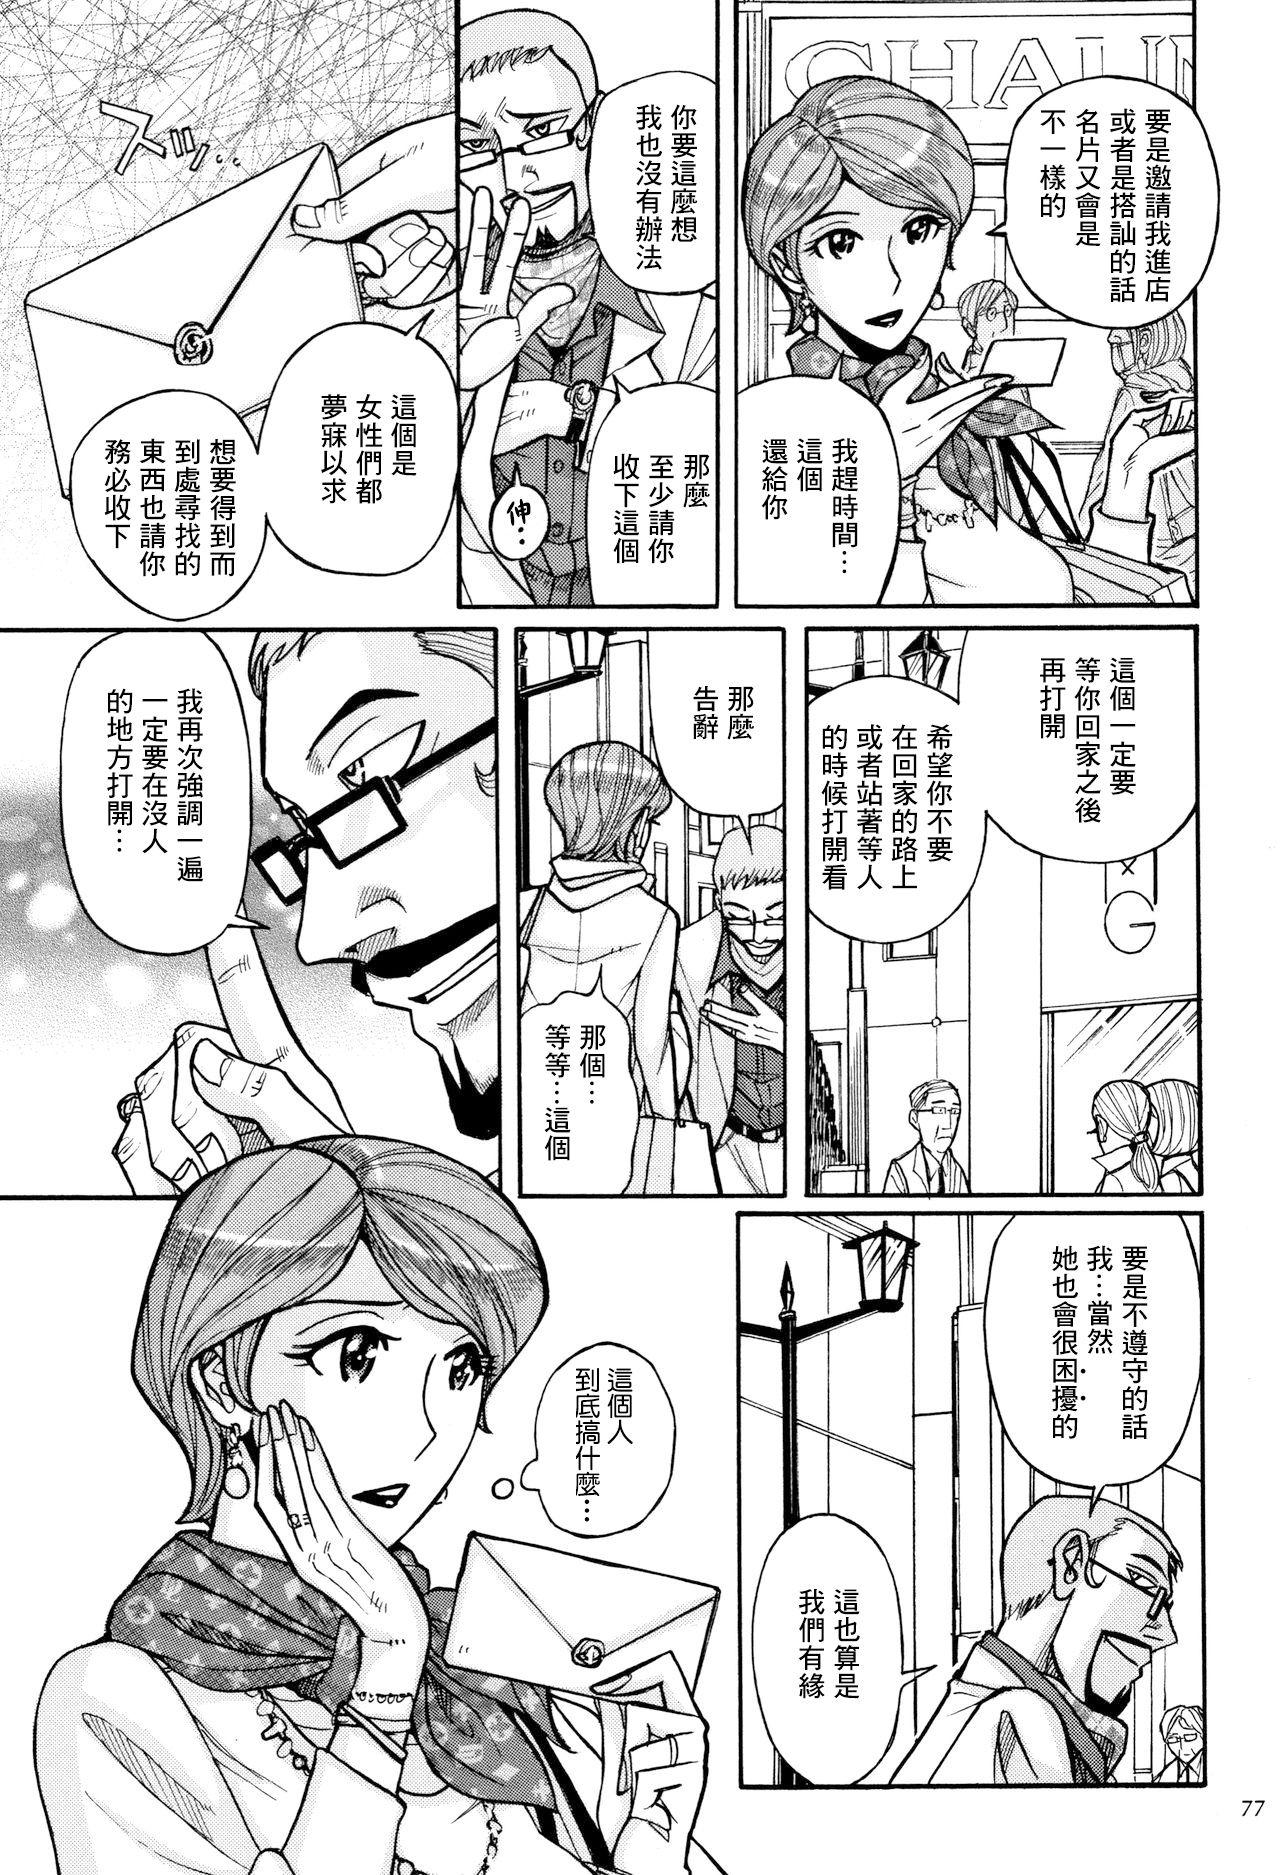 Hitozuma Hishuu Perfume Somurie | 人妻秘臭 香水·調配師 2